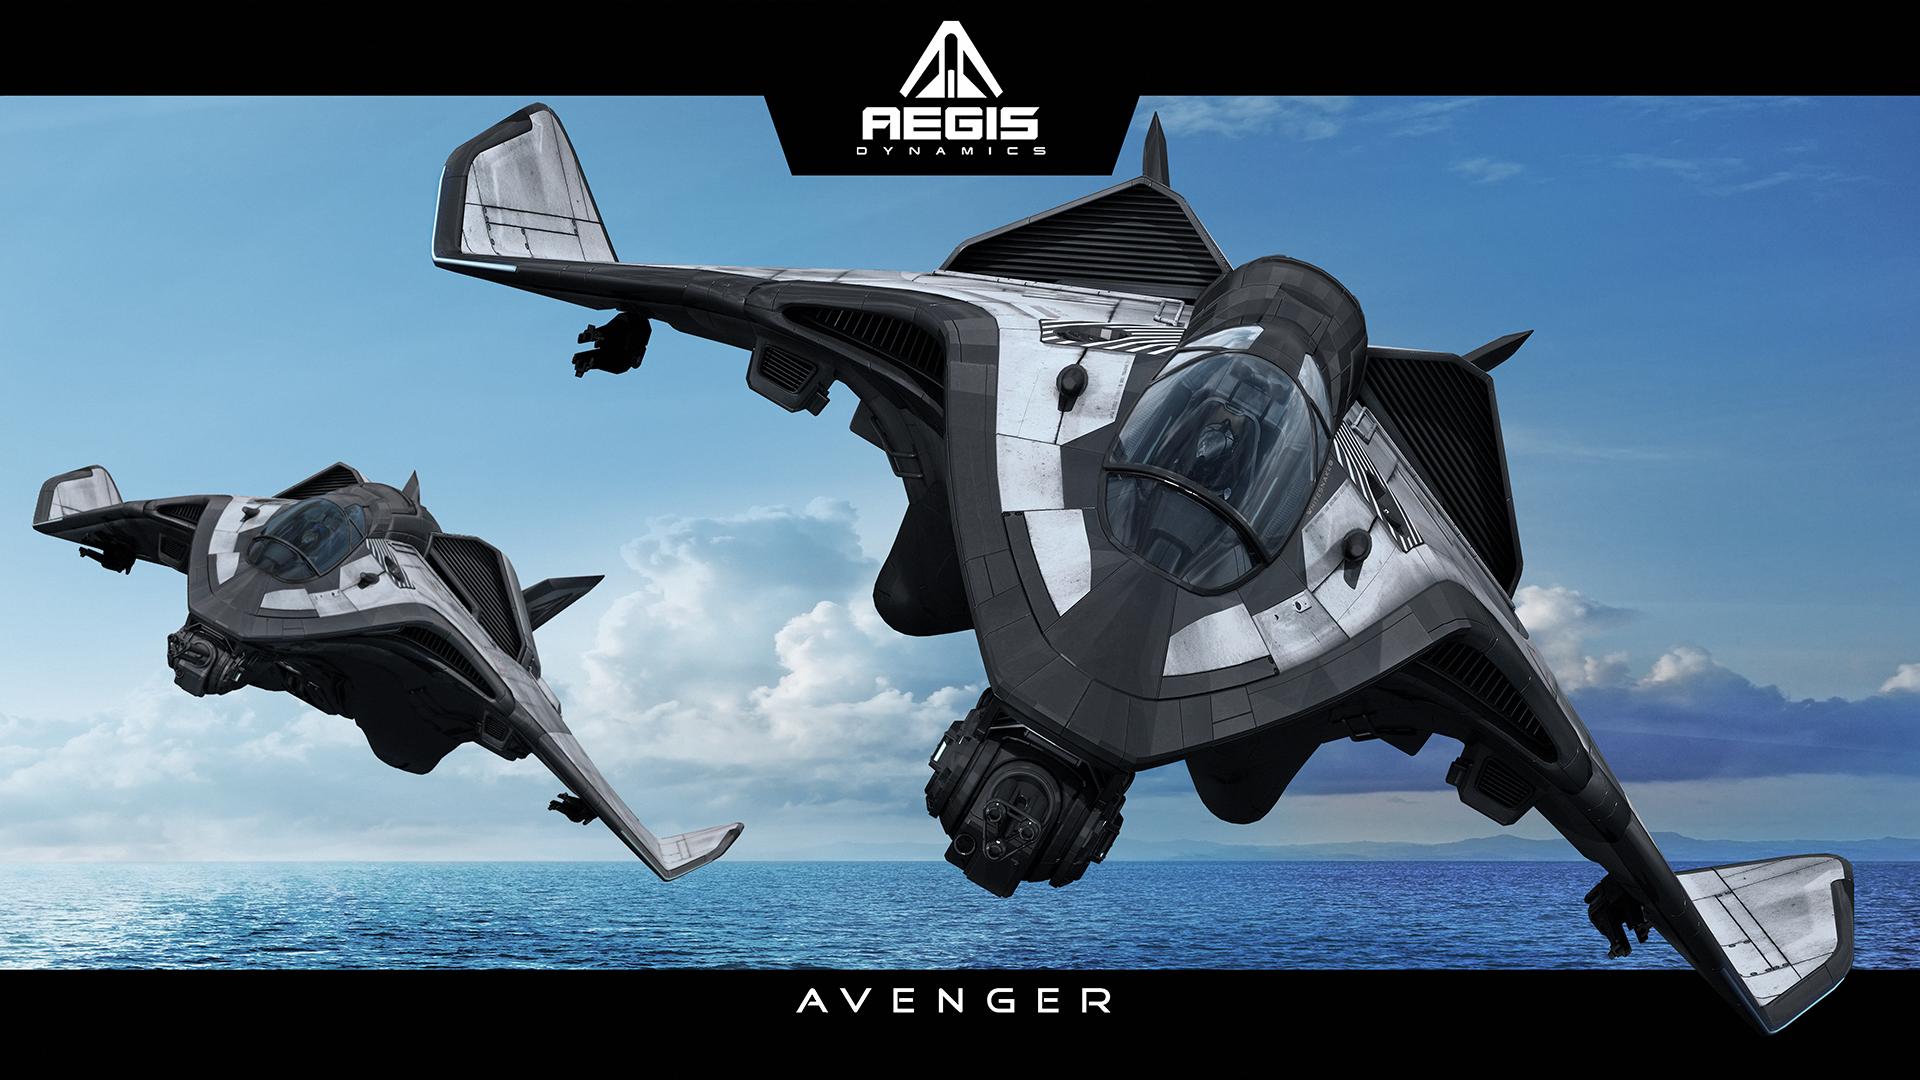 (Avenger Titan Photo Courtesy Aegis Dynamics)